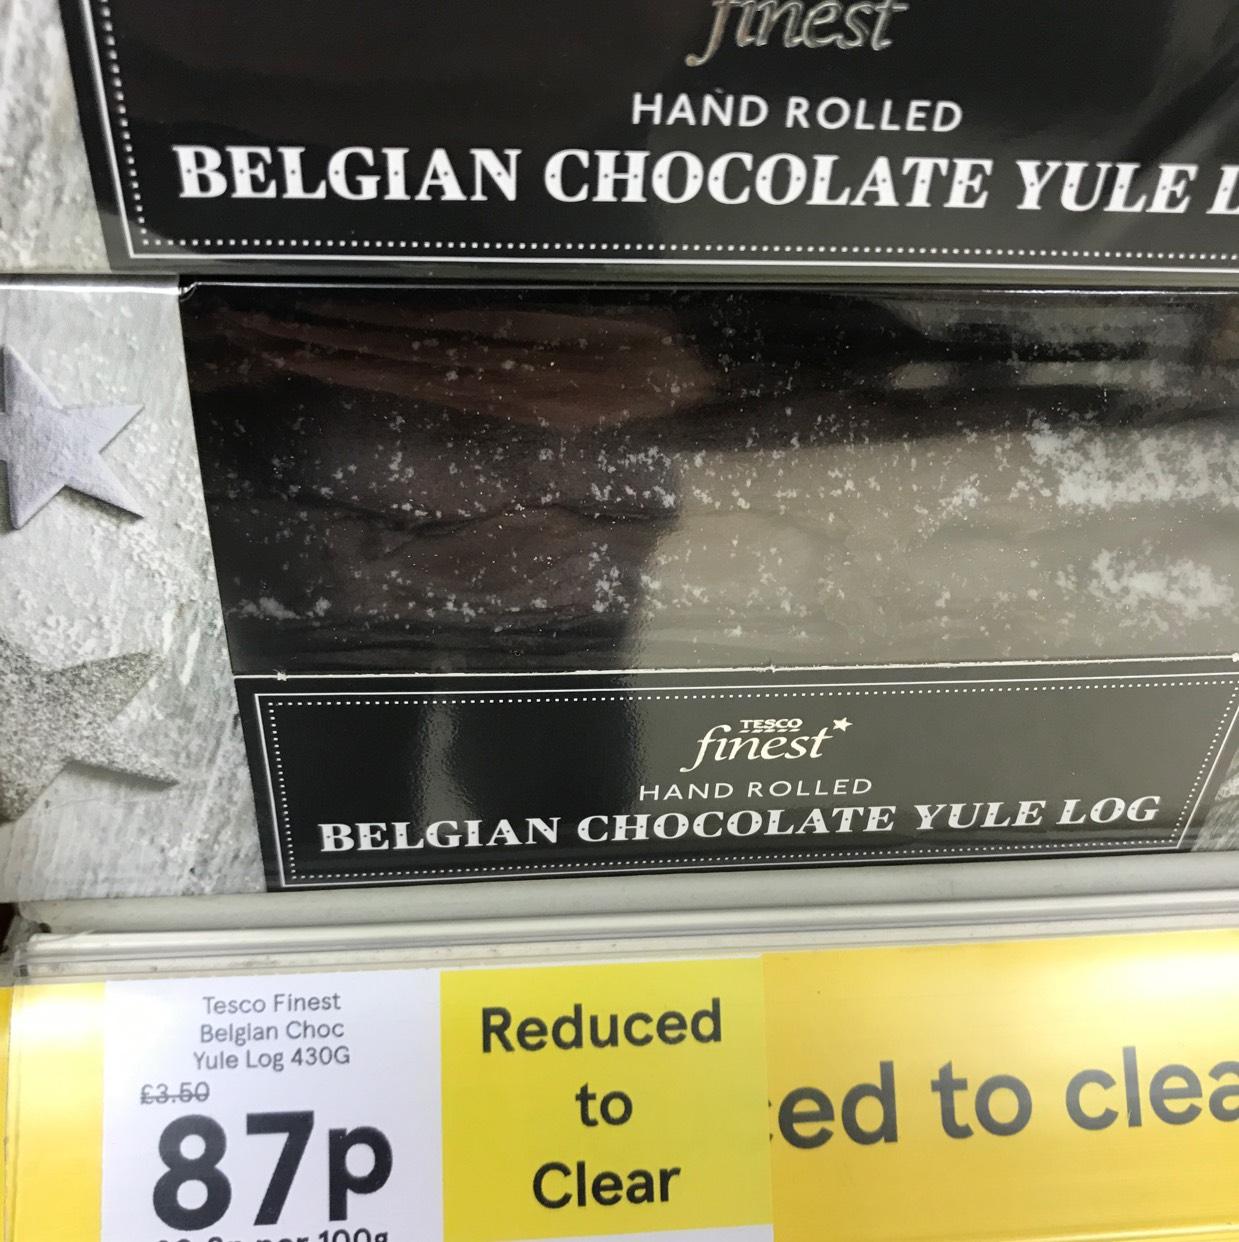 Tesco finest Belgian chocolate Yule log 87p instore